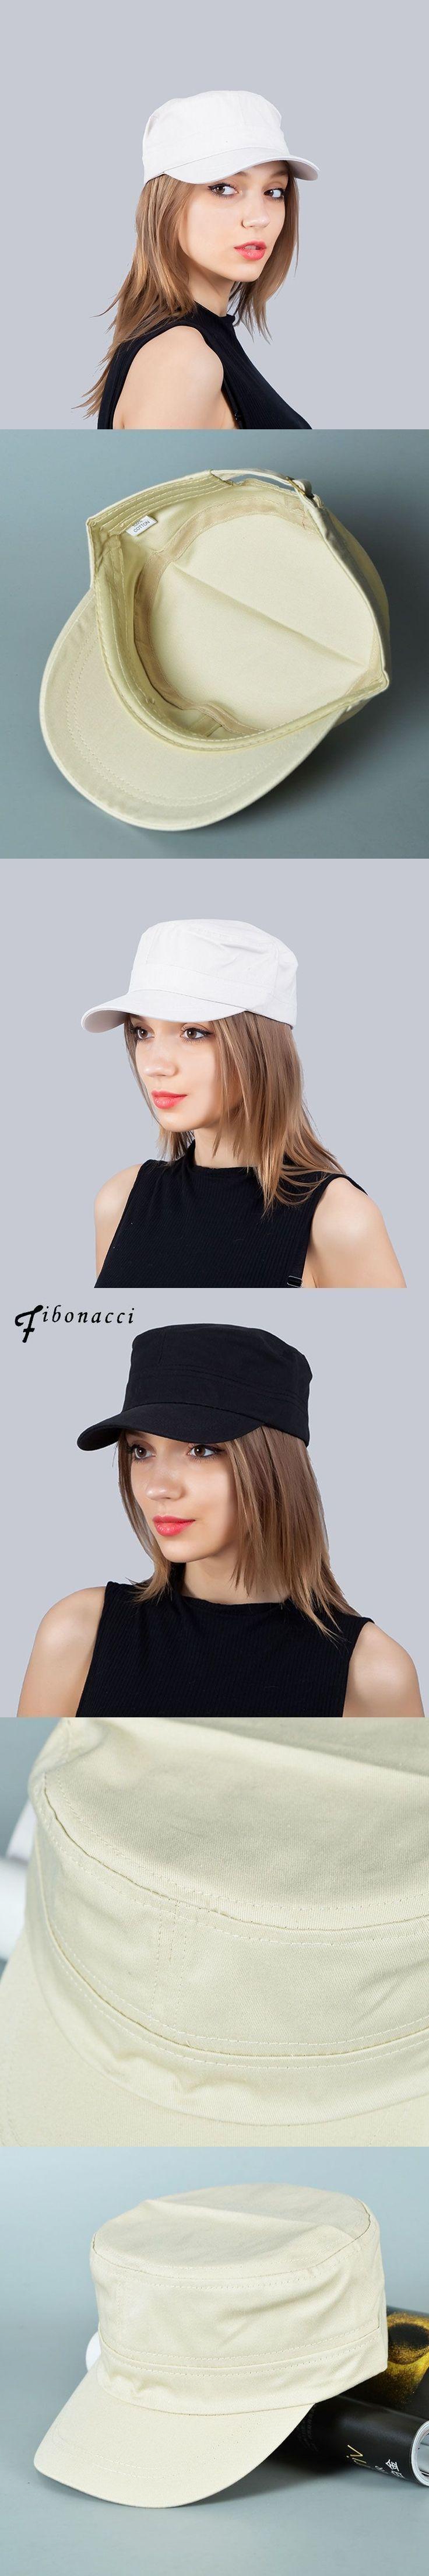 Army Military Cap Men Women Classic Solid Color Cotton Unisex Military Trucker Hats For Men Flat Top Caps #MilitaryHatsForWomen